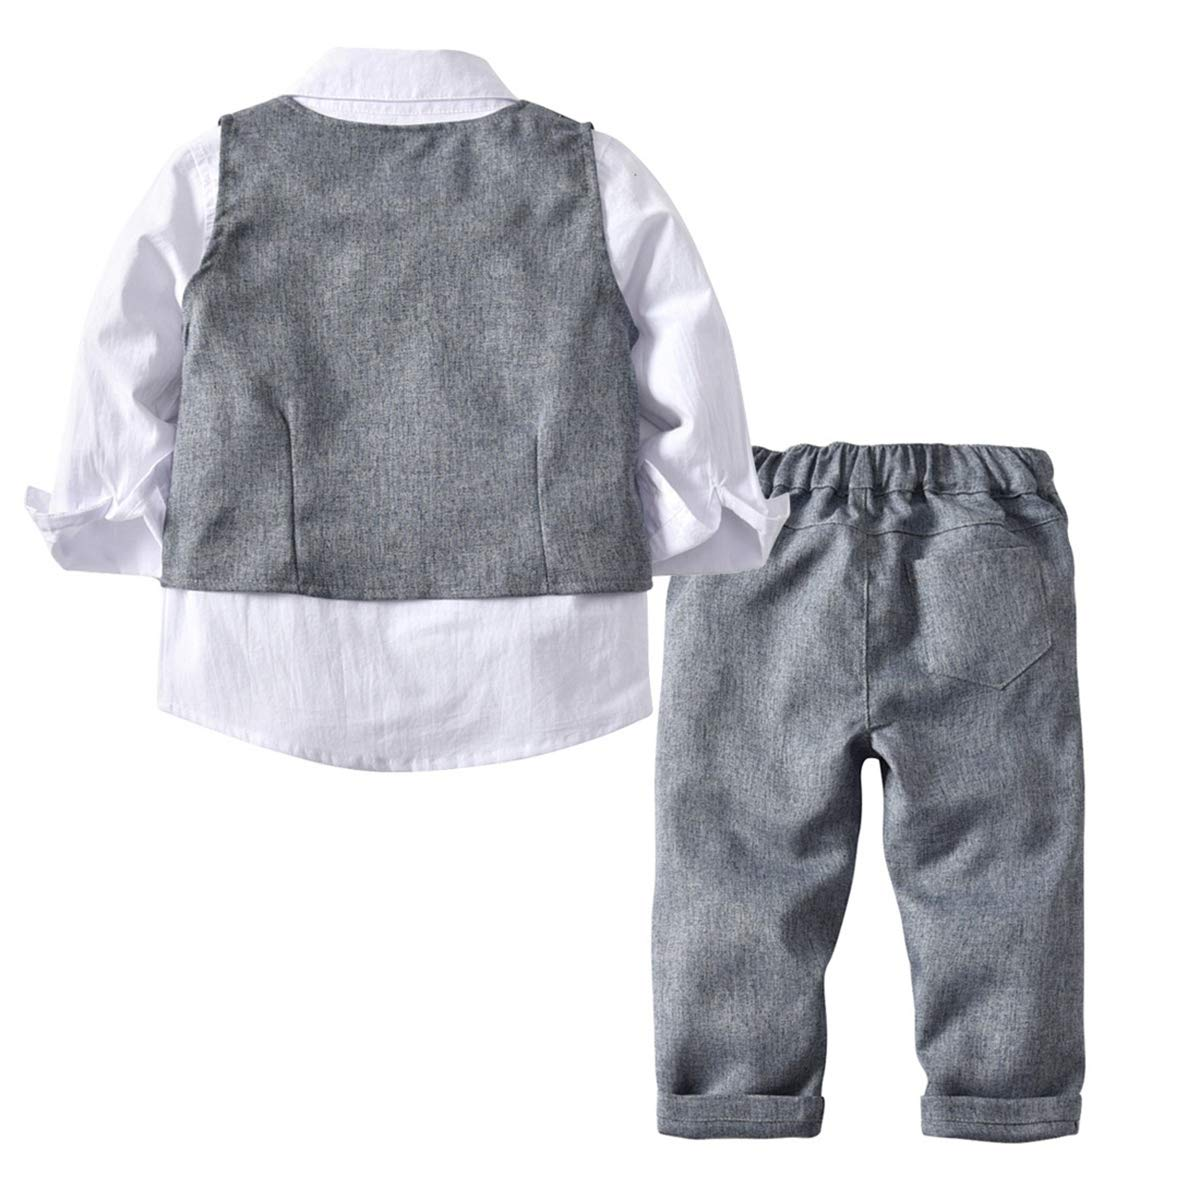 AceAcr Baby Boy Gentleman Outfit Set Formal Romper Infant Tuxedo Dress Suits Vest with Bow Tie 4PCS Dresswear White